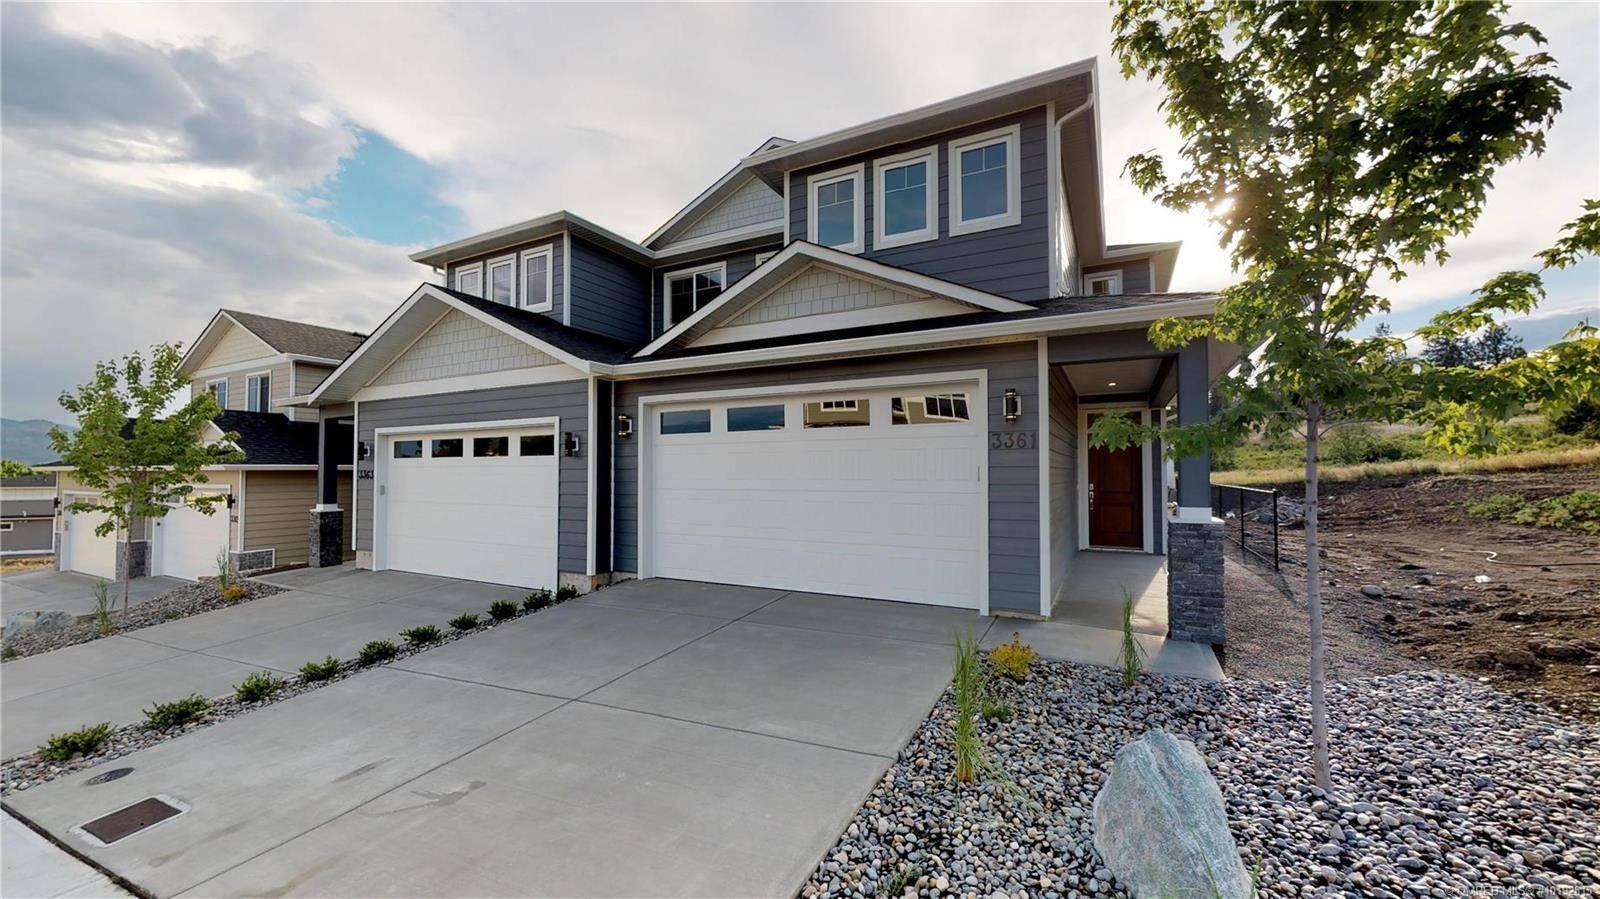 House for sale at 3371 Hawks Cres West Kelowna British Columbia - MLS: 10192815